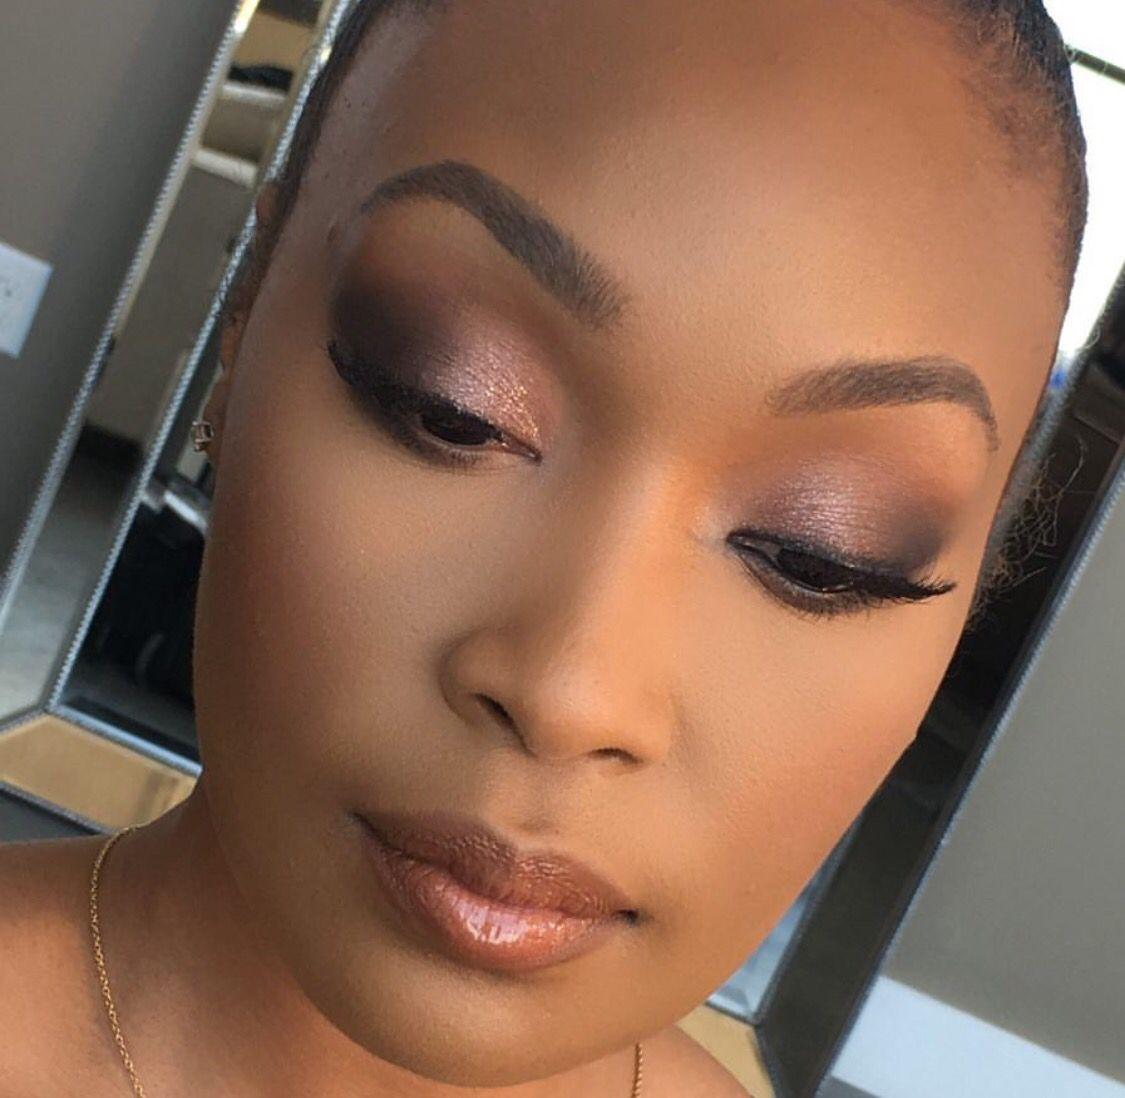 Makeup for black women Makeup for black women, Black